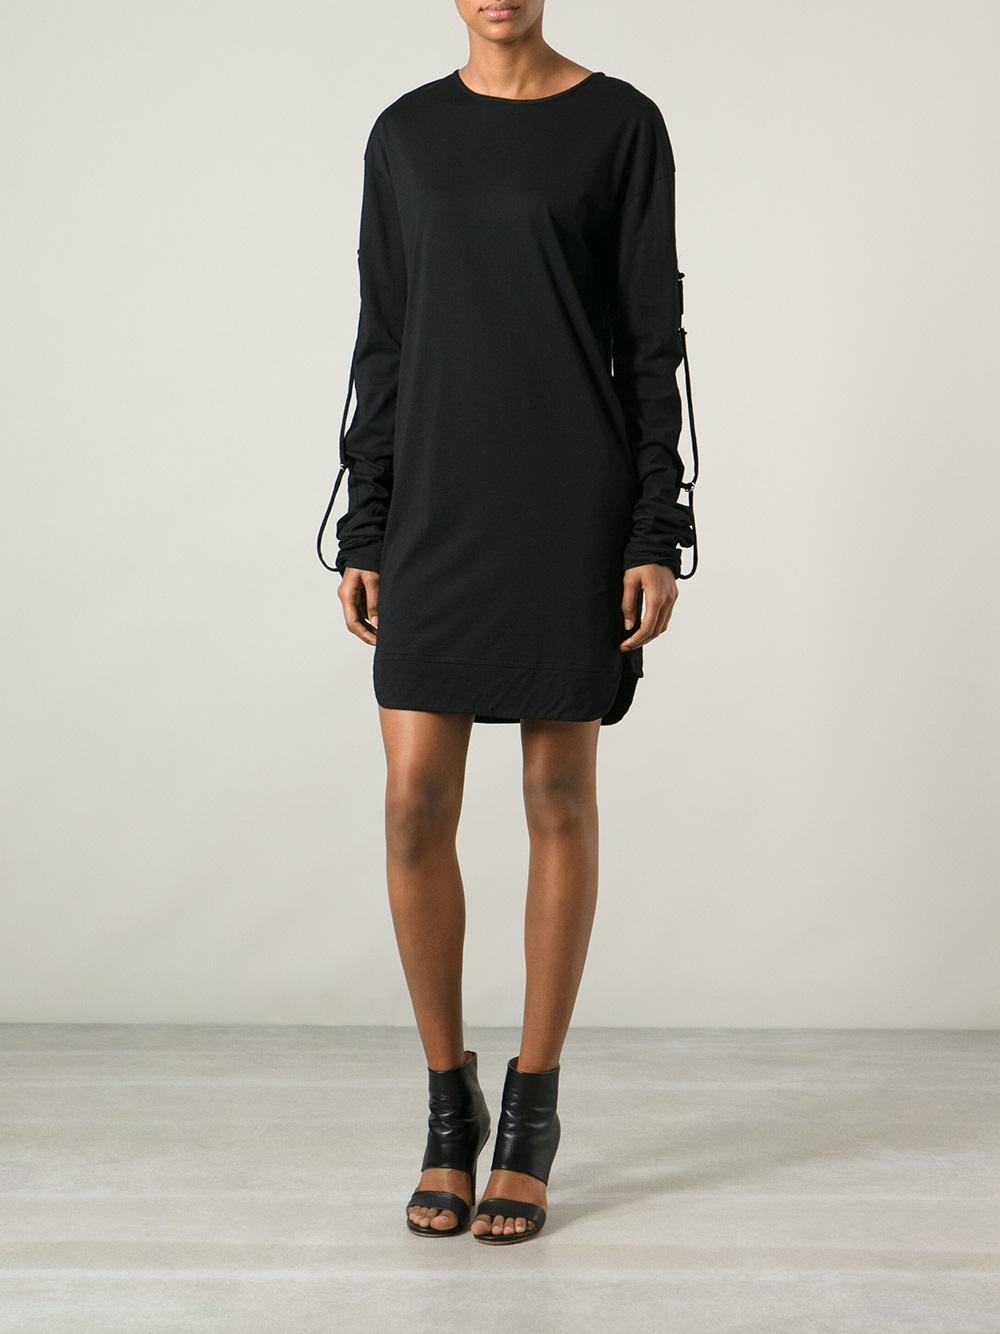 Lyst isabel marant tshirt dress in black for Isabel marant shirt dress